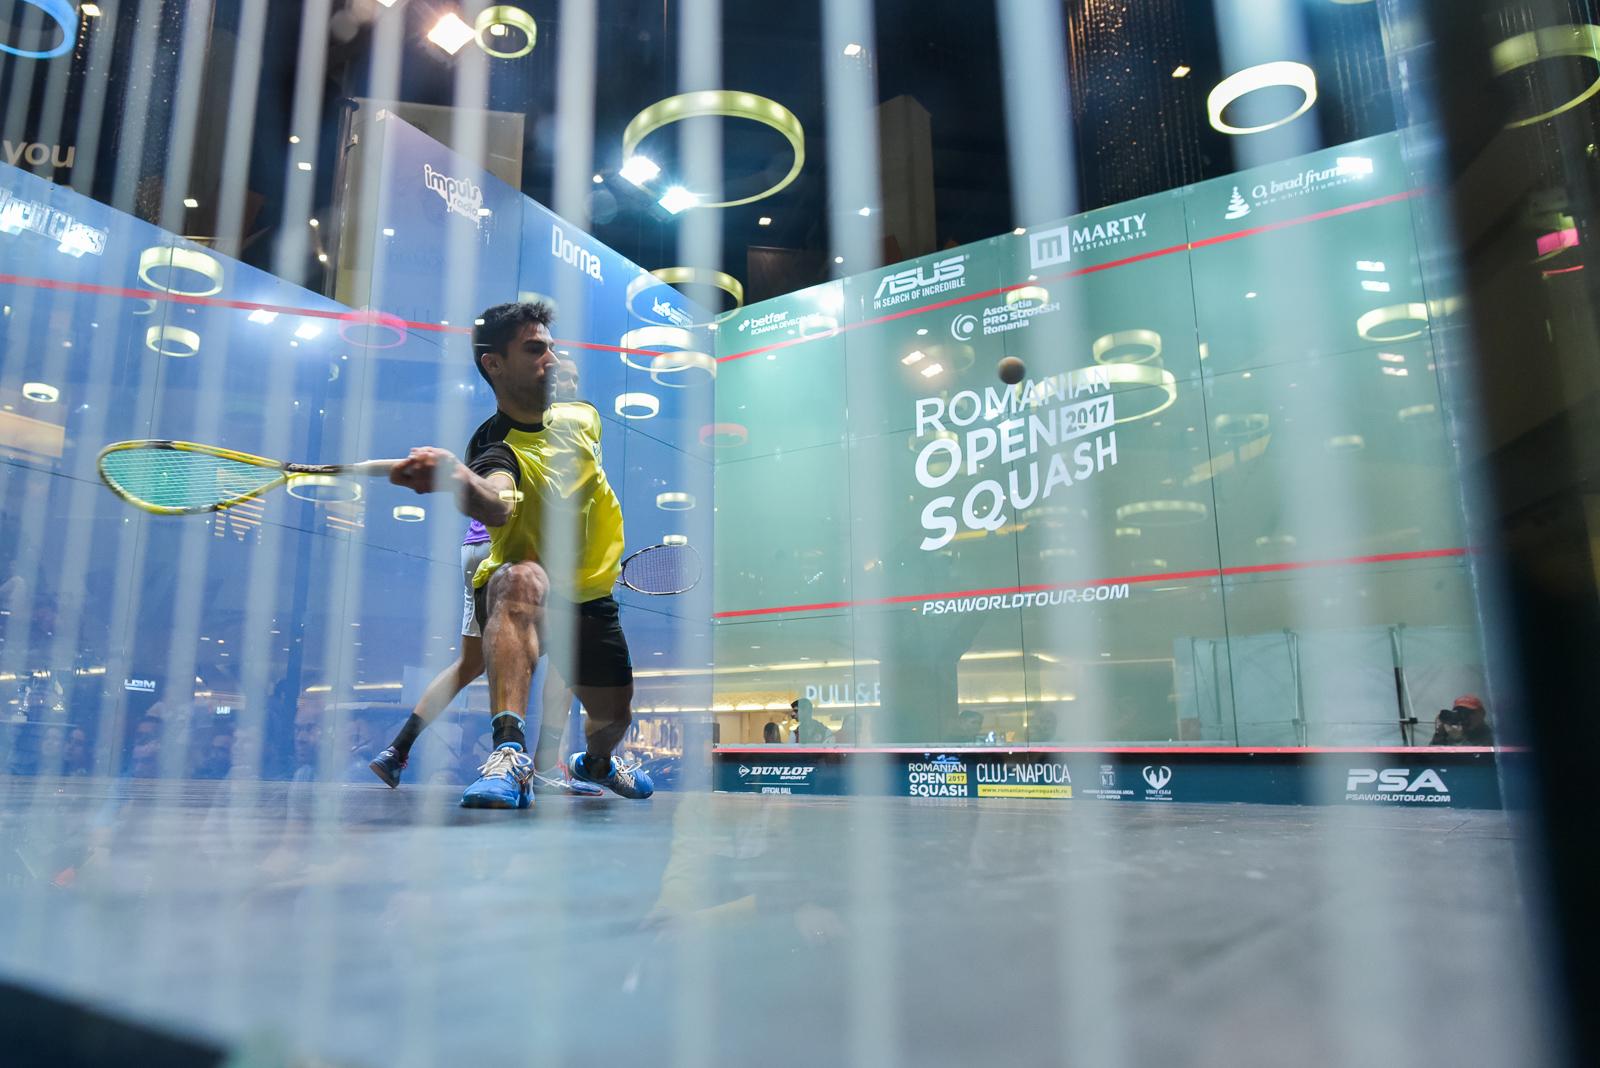 Romanian Open Squash